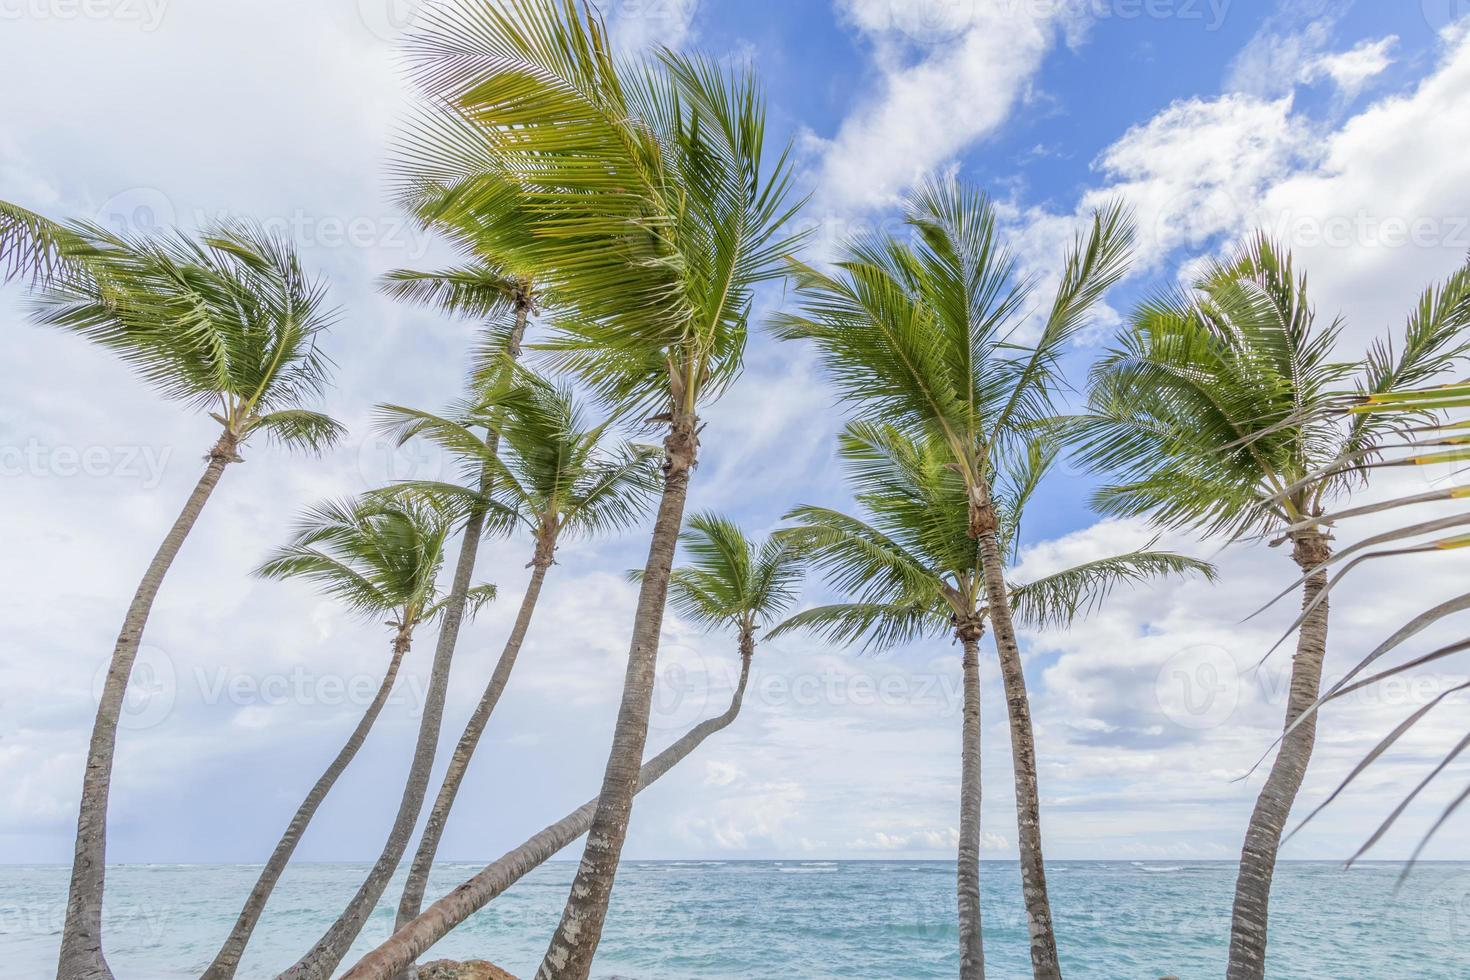 palmeiras na praia. foto